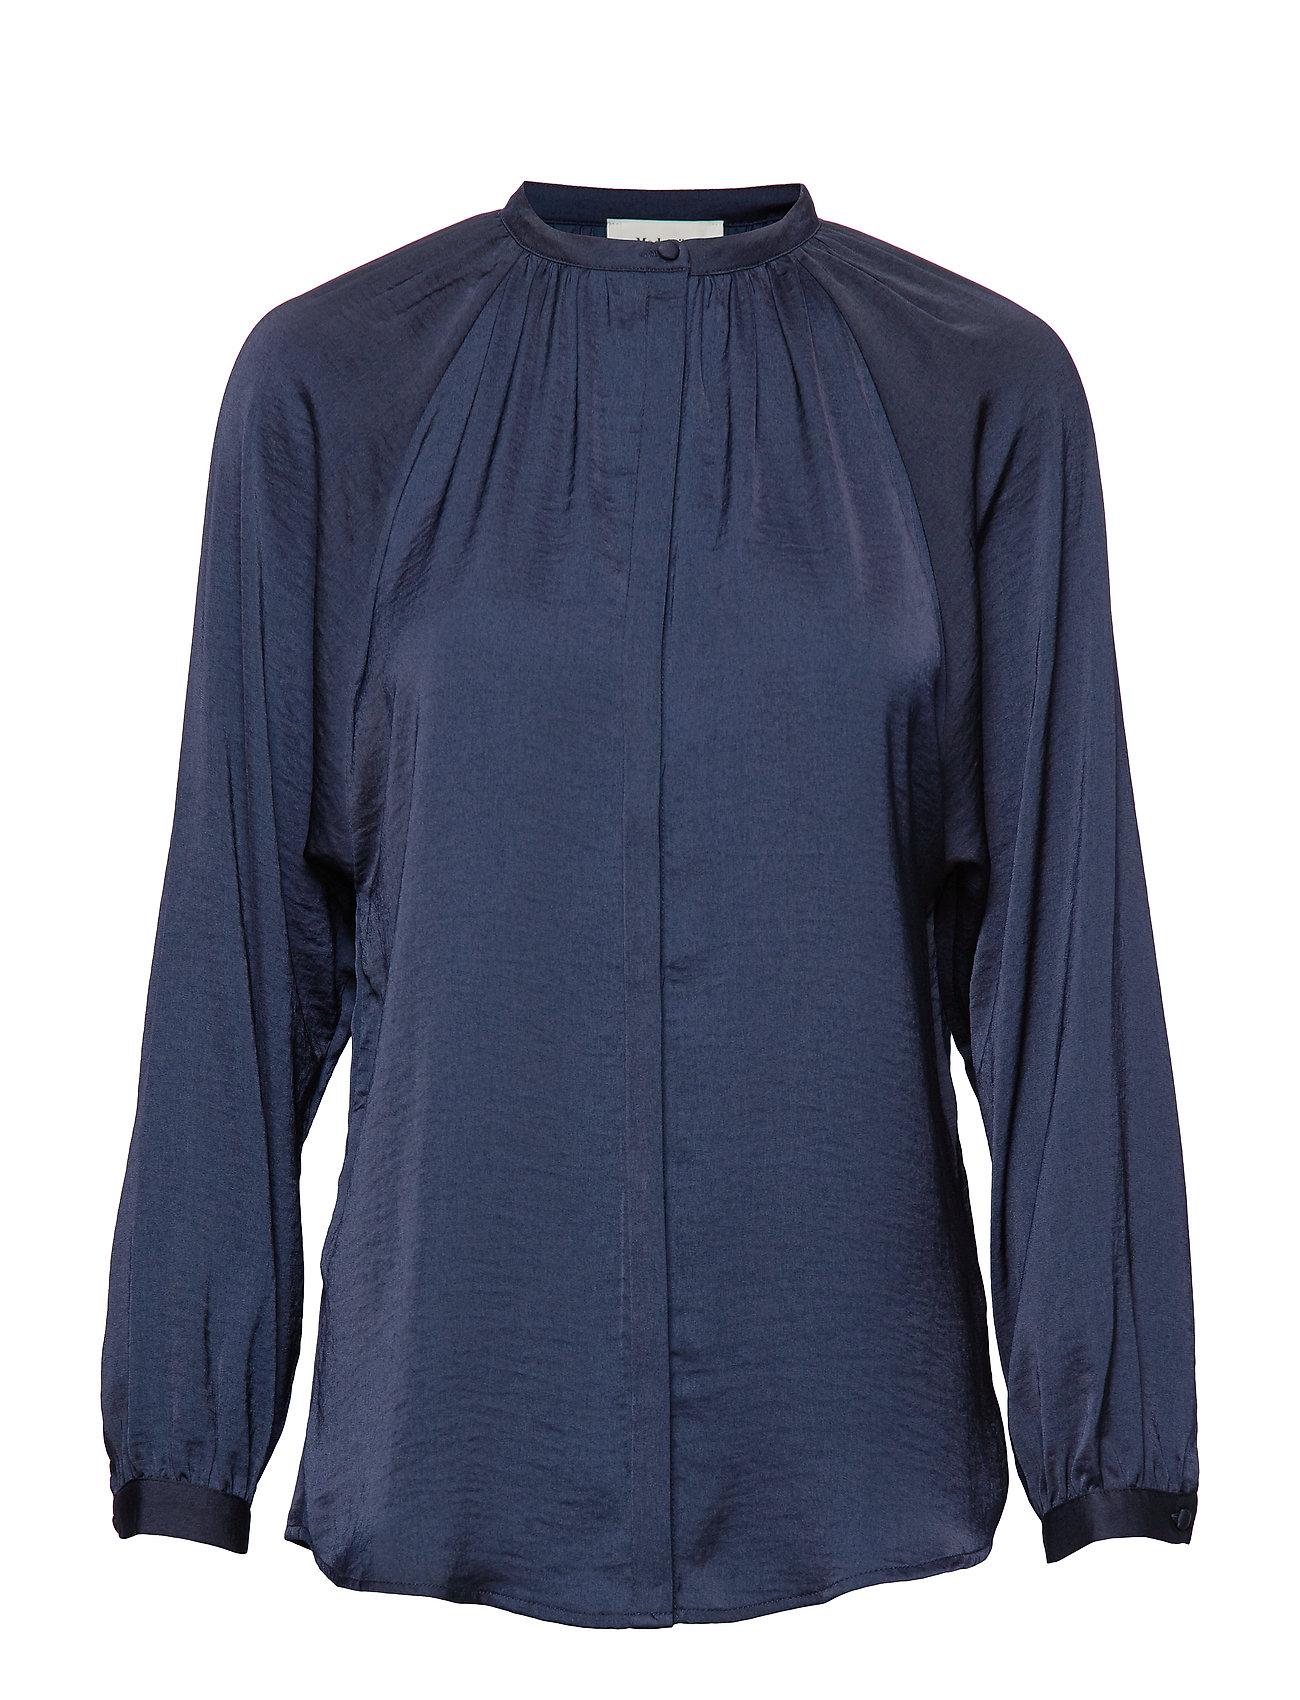 Modström Said shirt - NAVY SKY